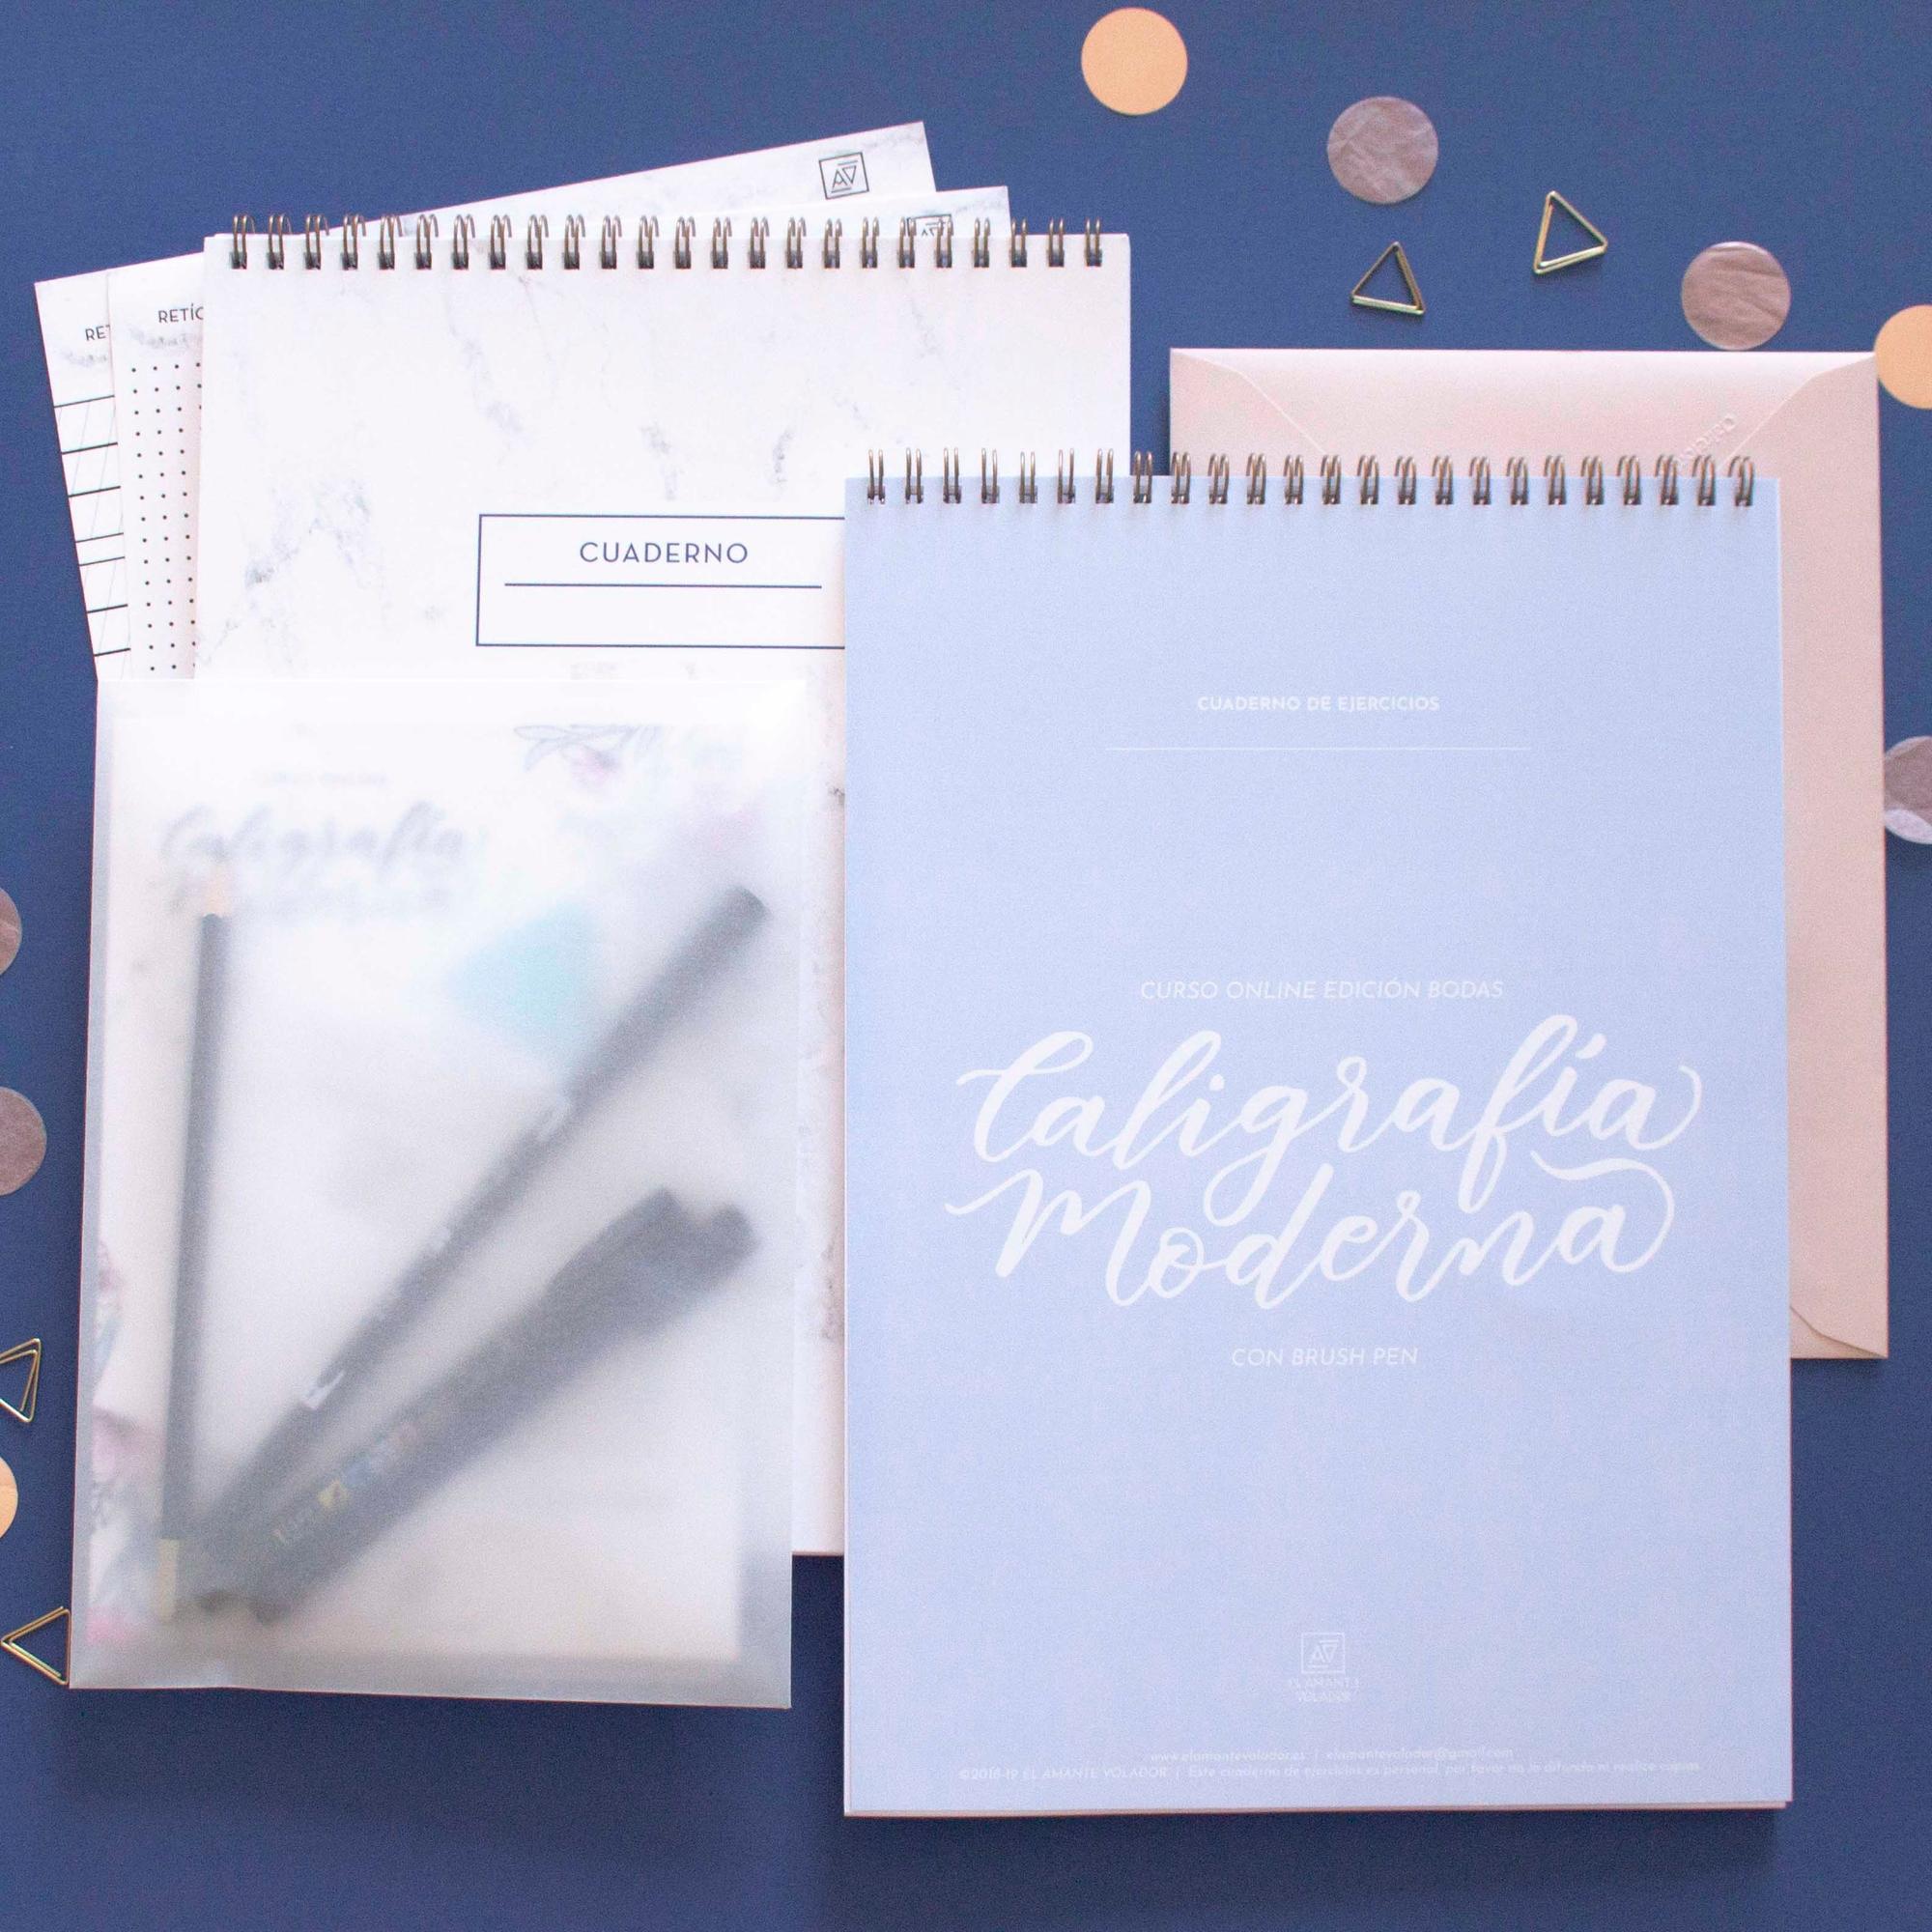 material-curso-caligrafia-moderna-el_amante_volador_02-1.jpeg